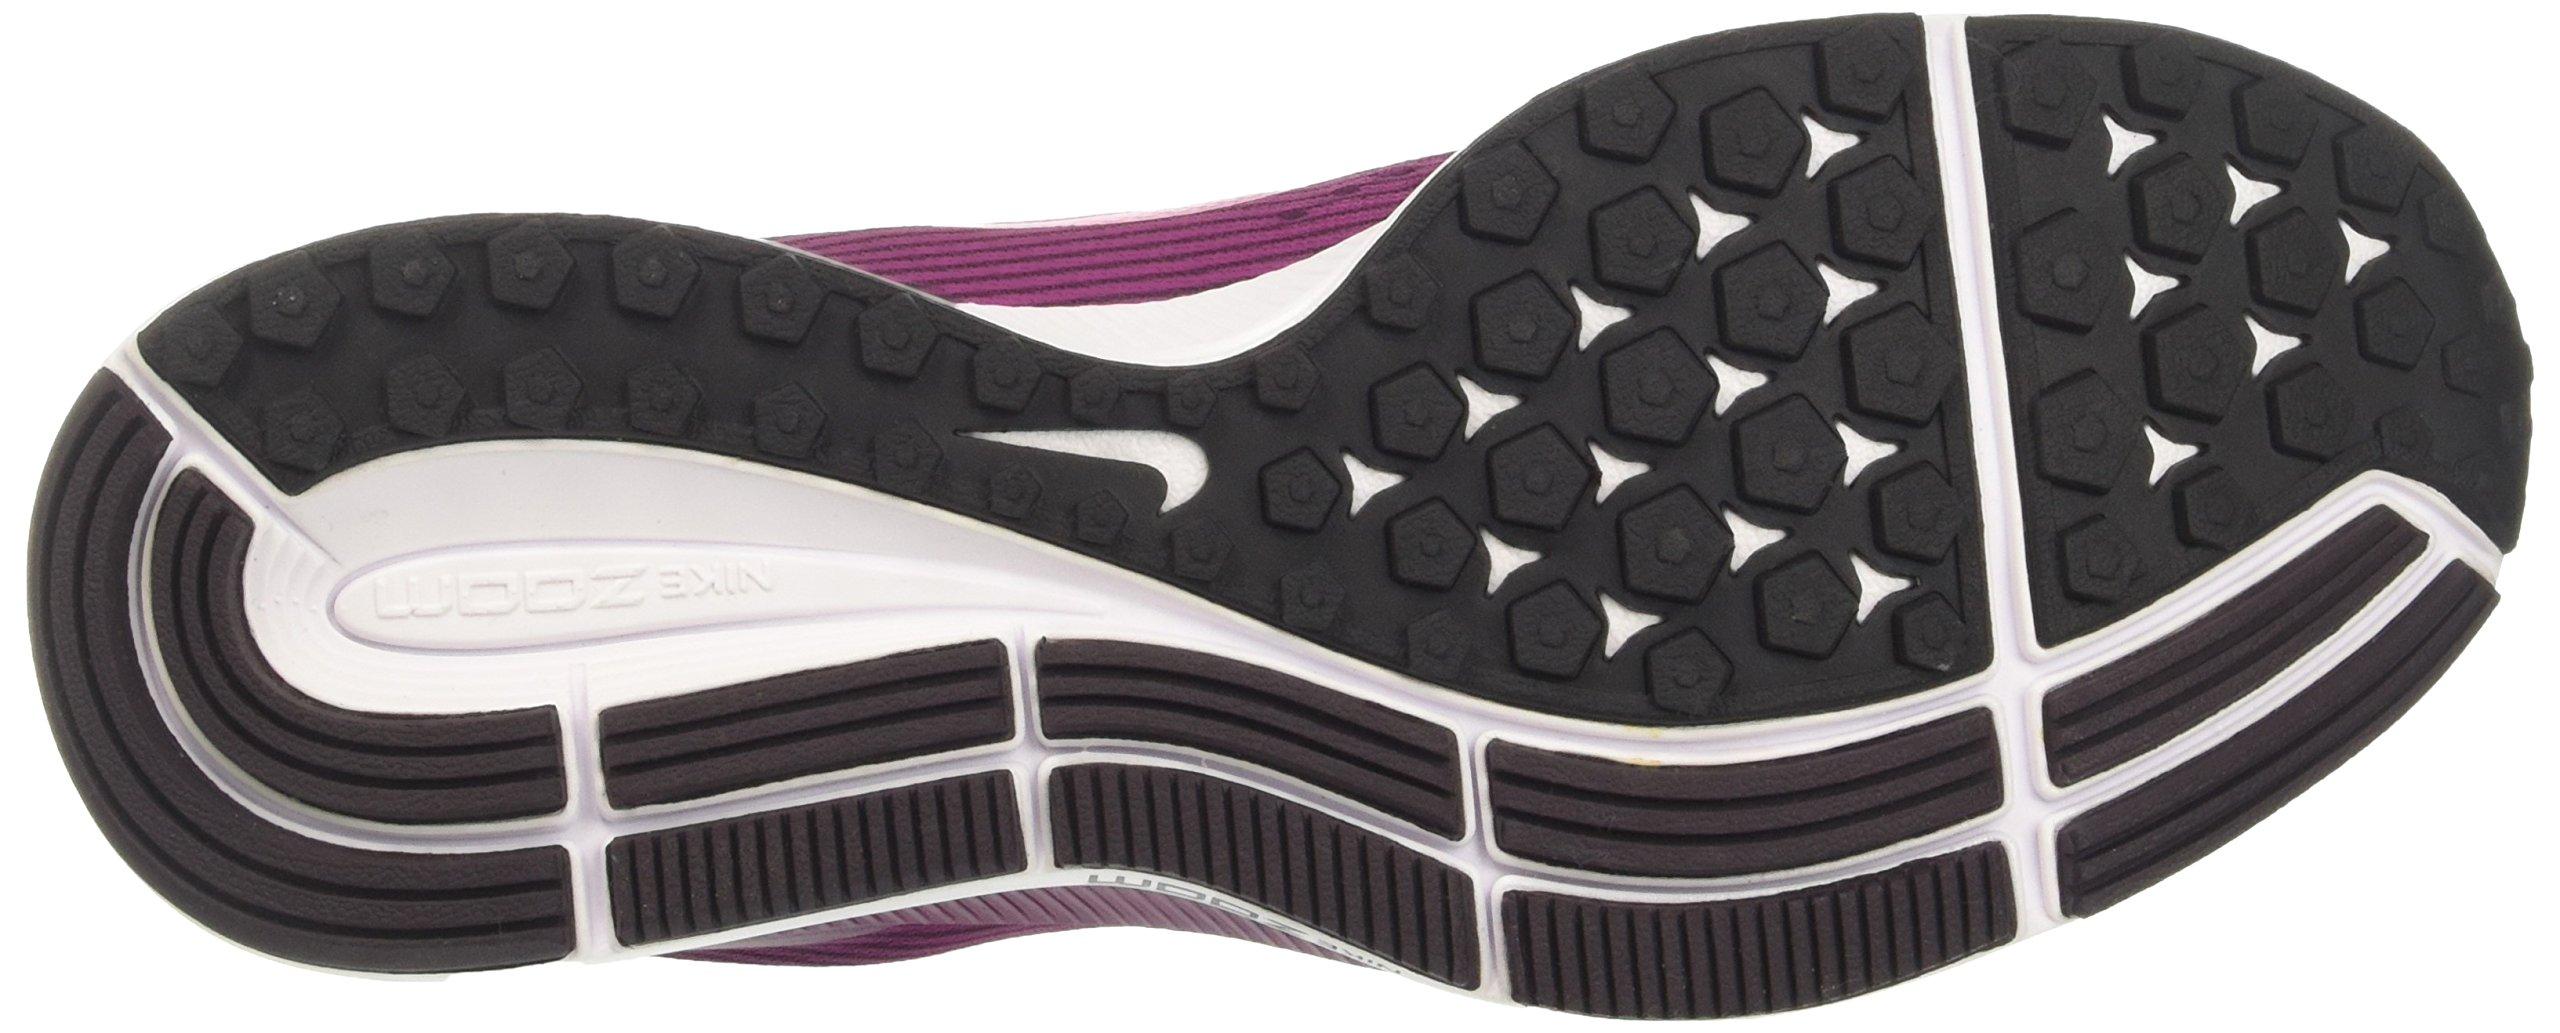 NIKE Women's Air Zoom Pegasus 34 Port Wine/Deadly Pink Running Shoe 7 Women US by NIKE (Image #3)